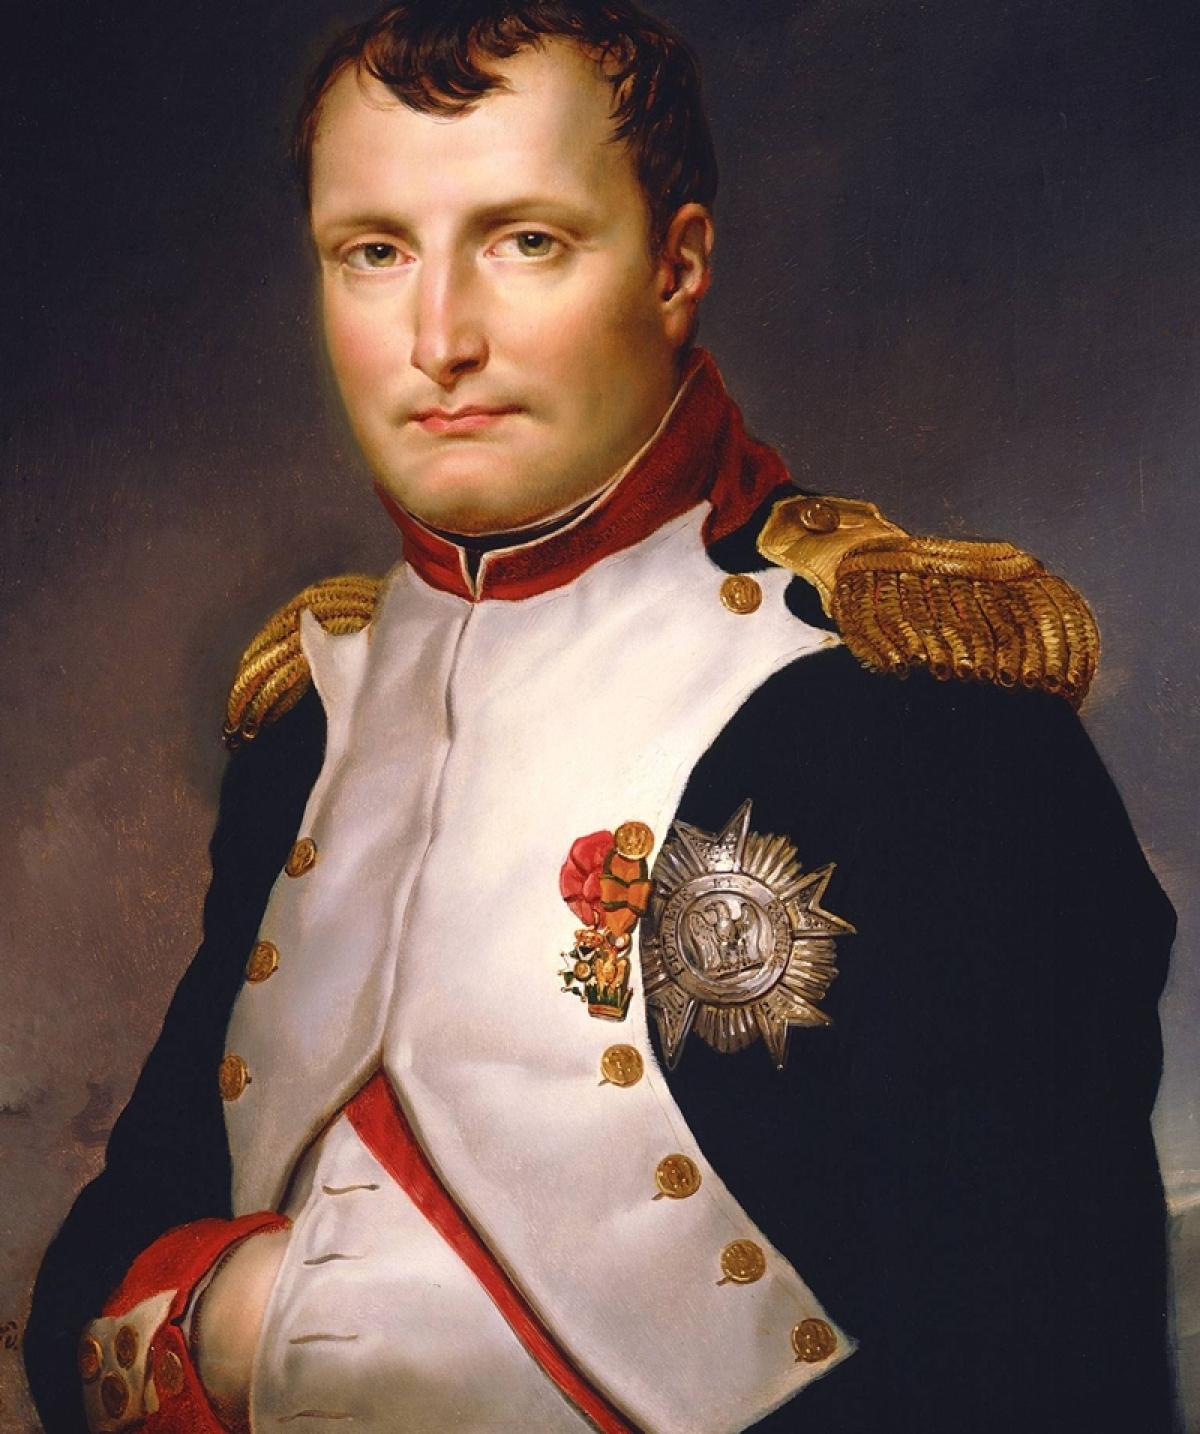 Napoleon Bonaparte love letters to Josephine fetch USD 5.7 lakh